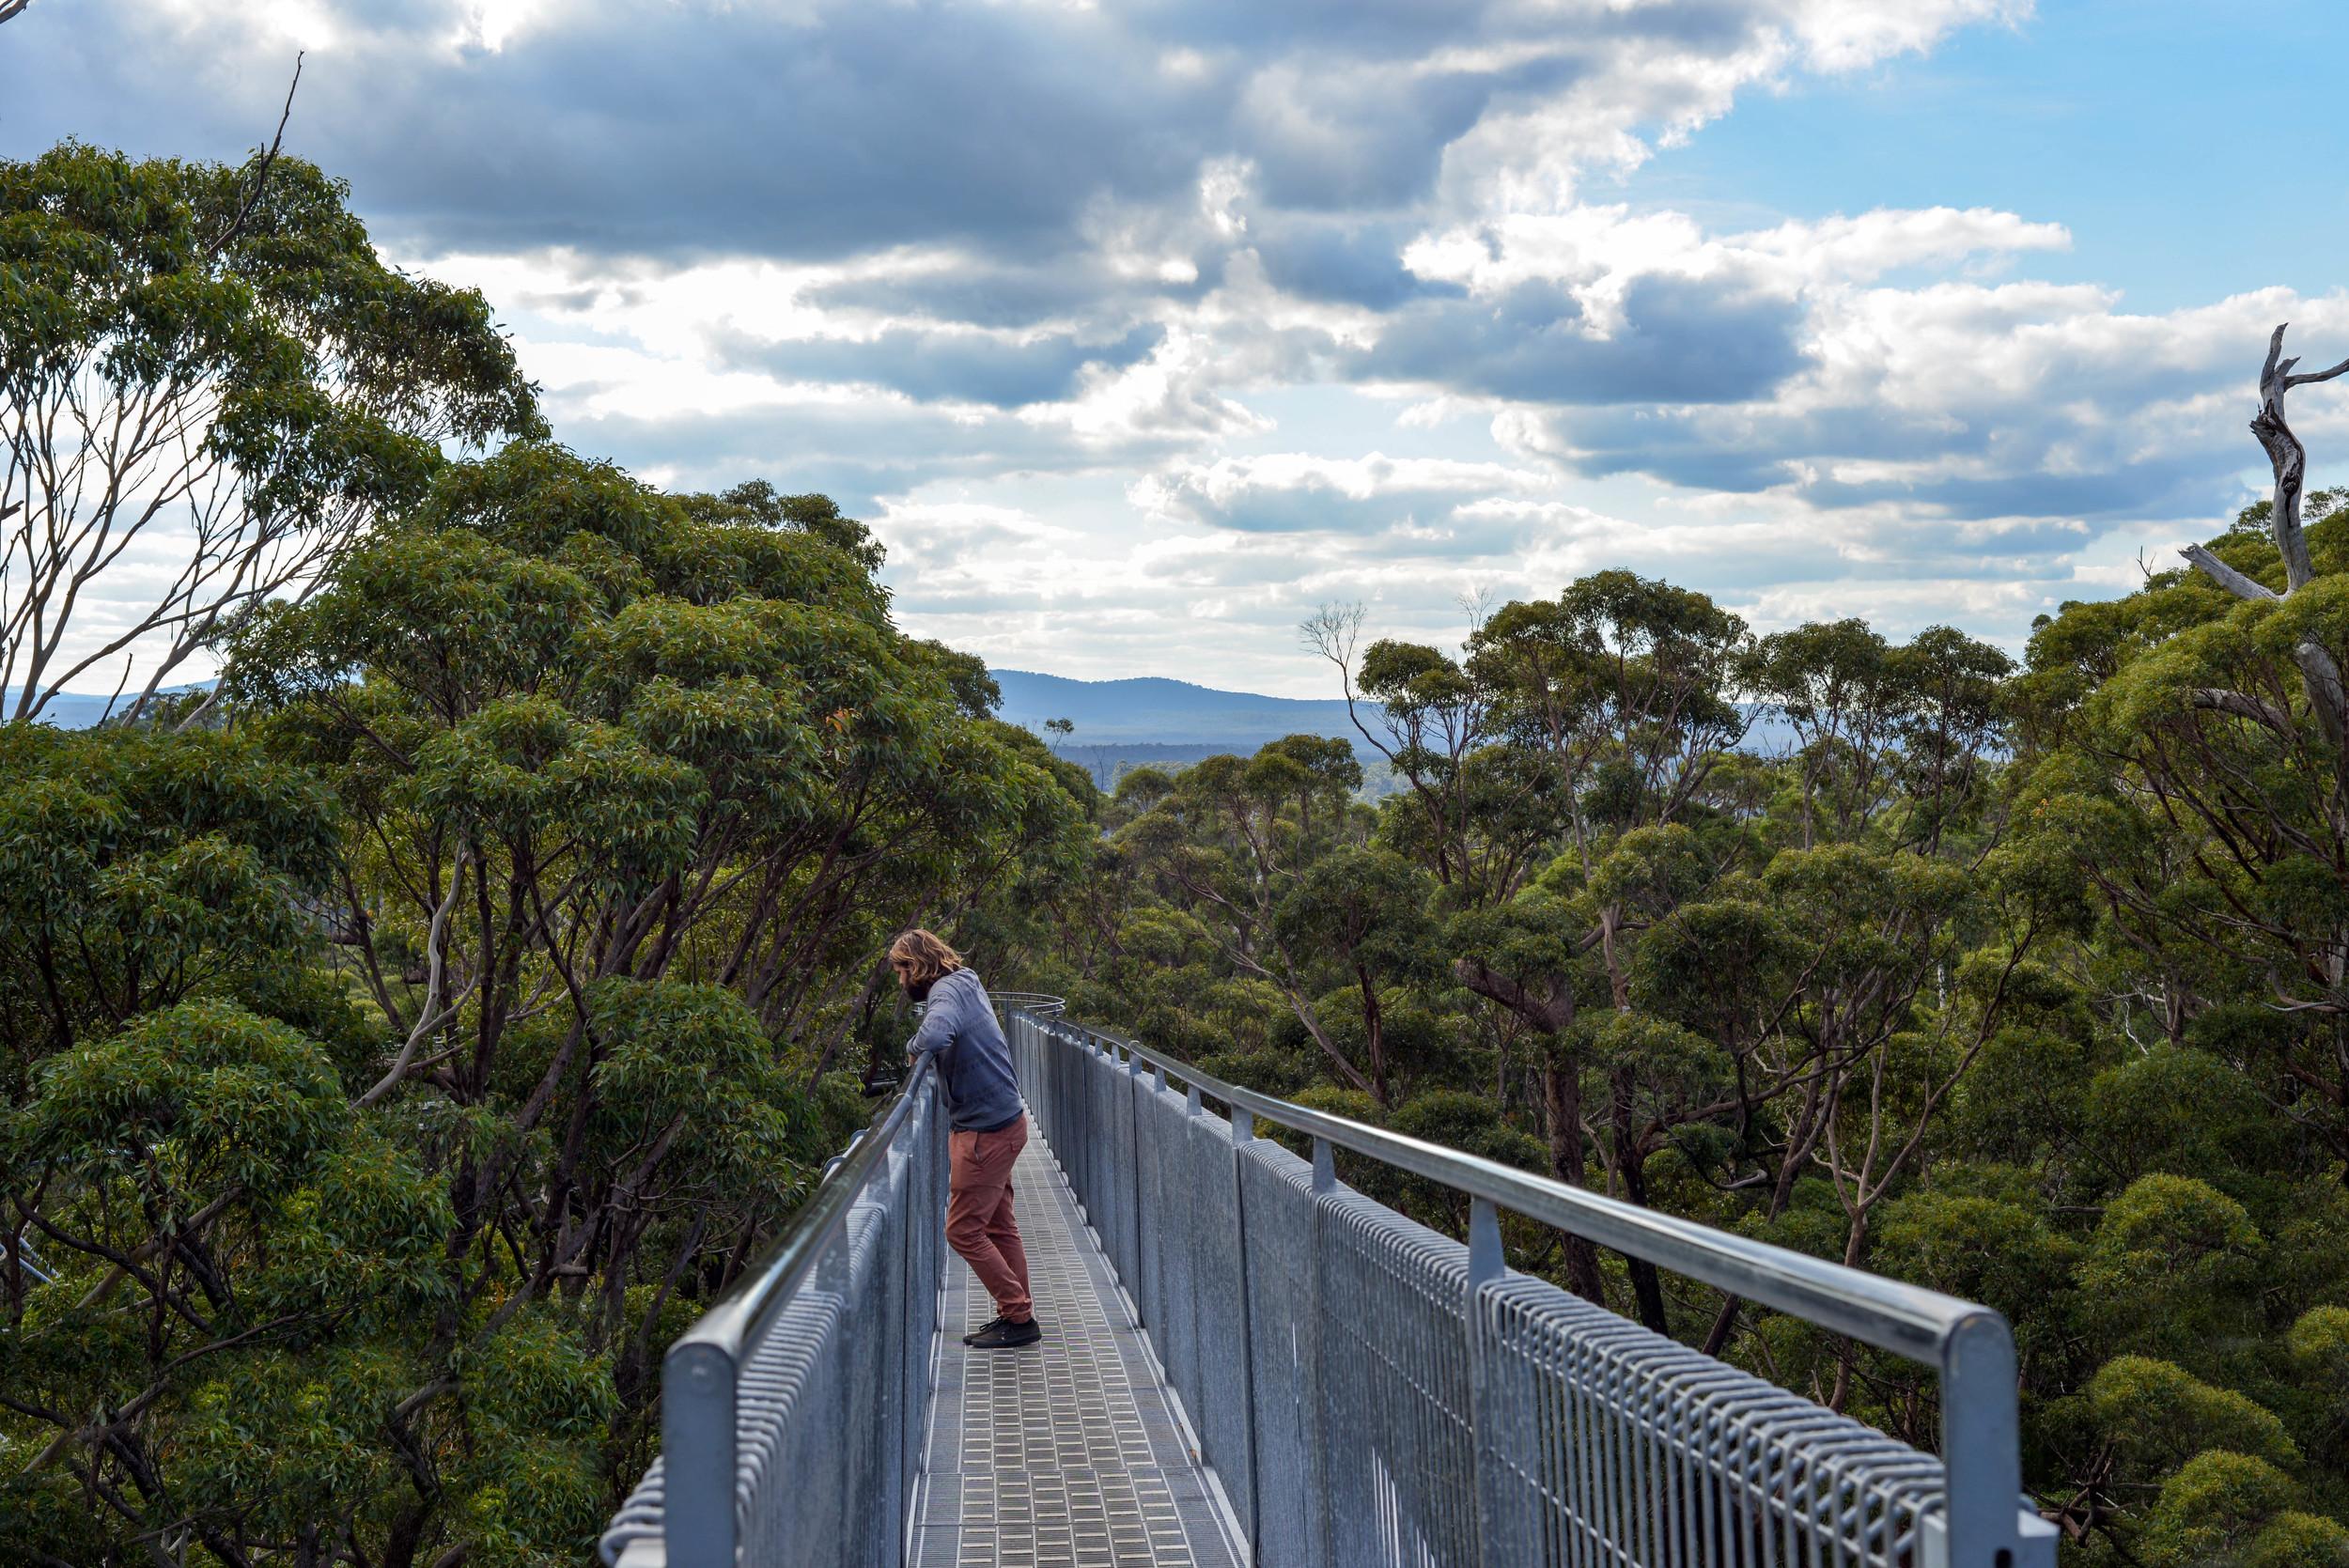 High in the tree tops, Western Australia.